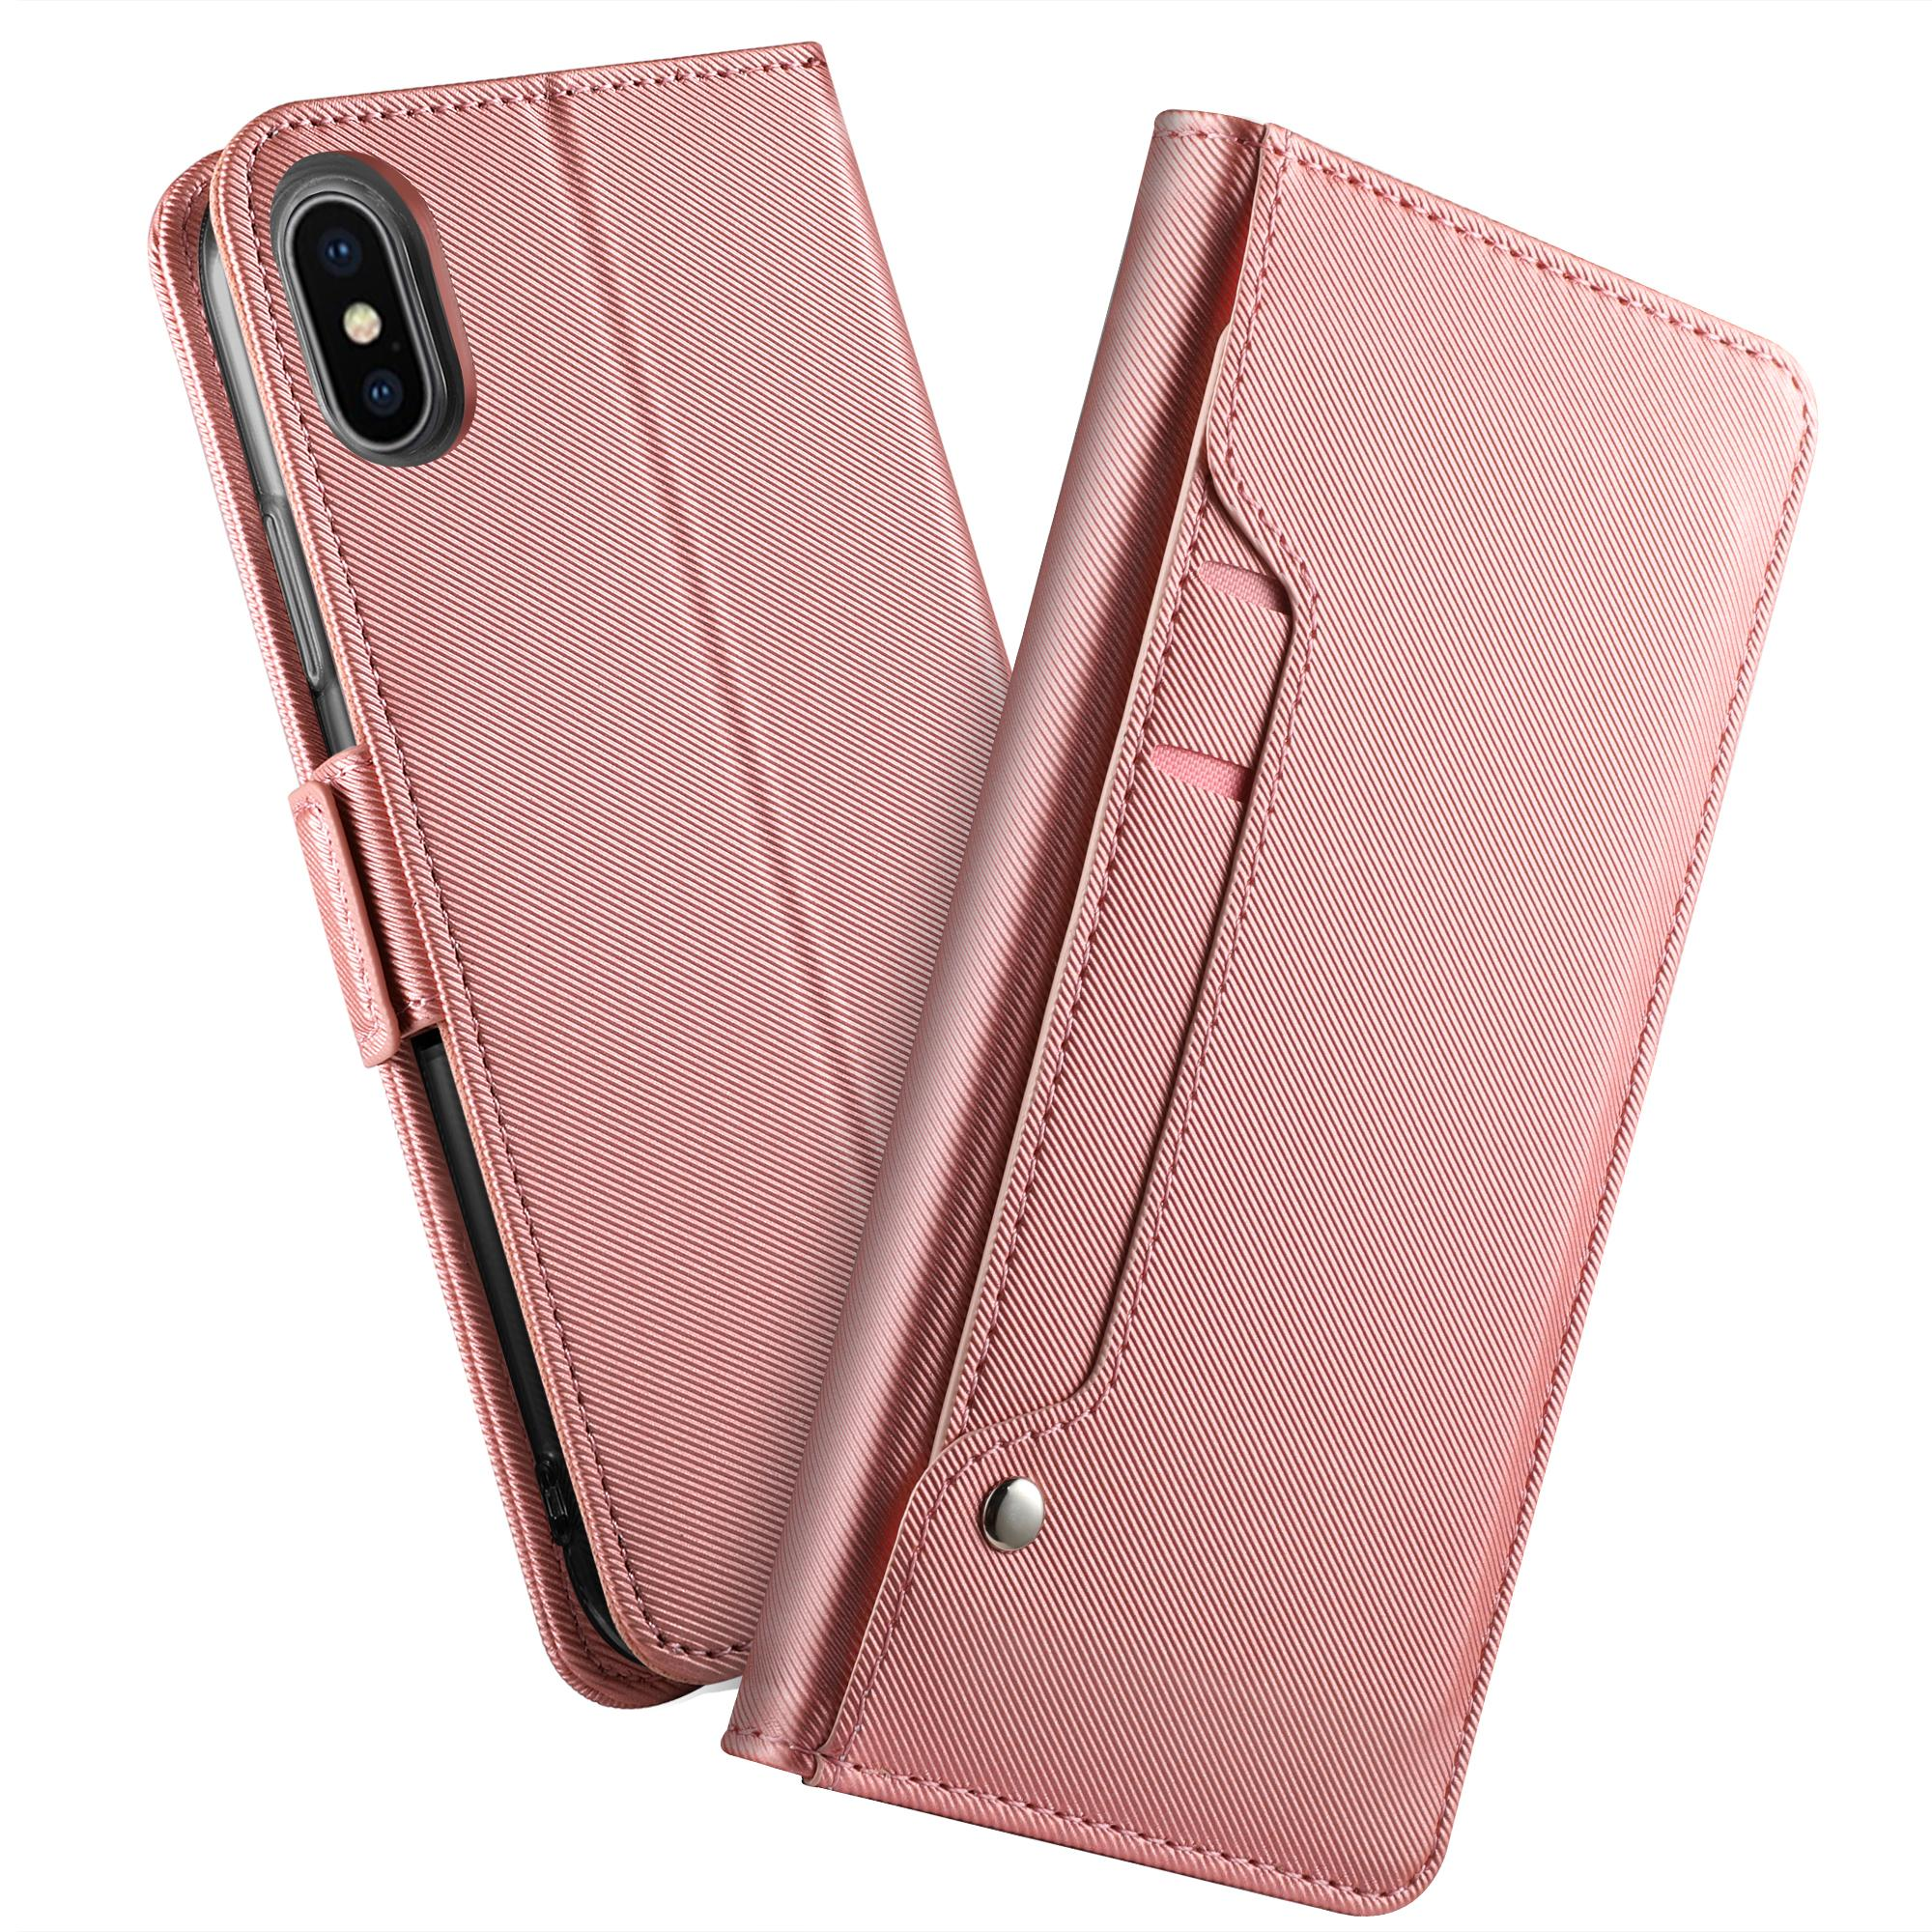 Plånboksfodral Spegel Apple iPhone XR Rosa Guld